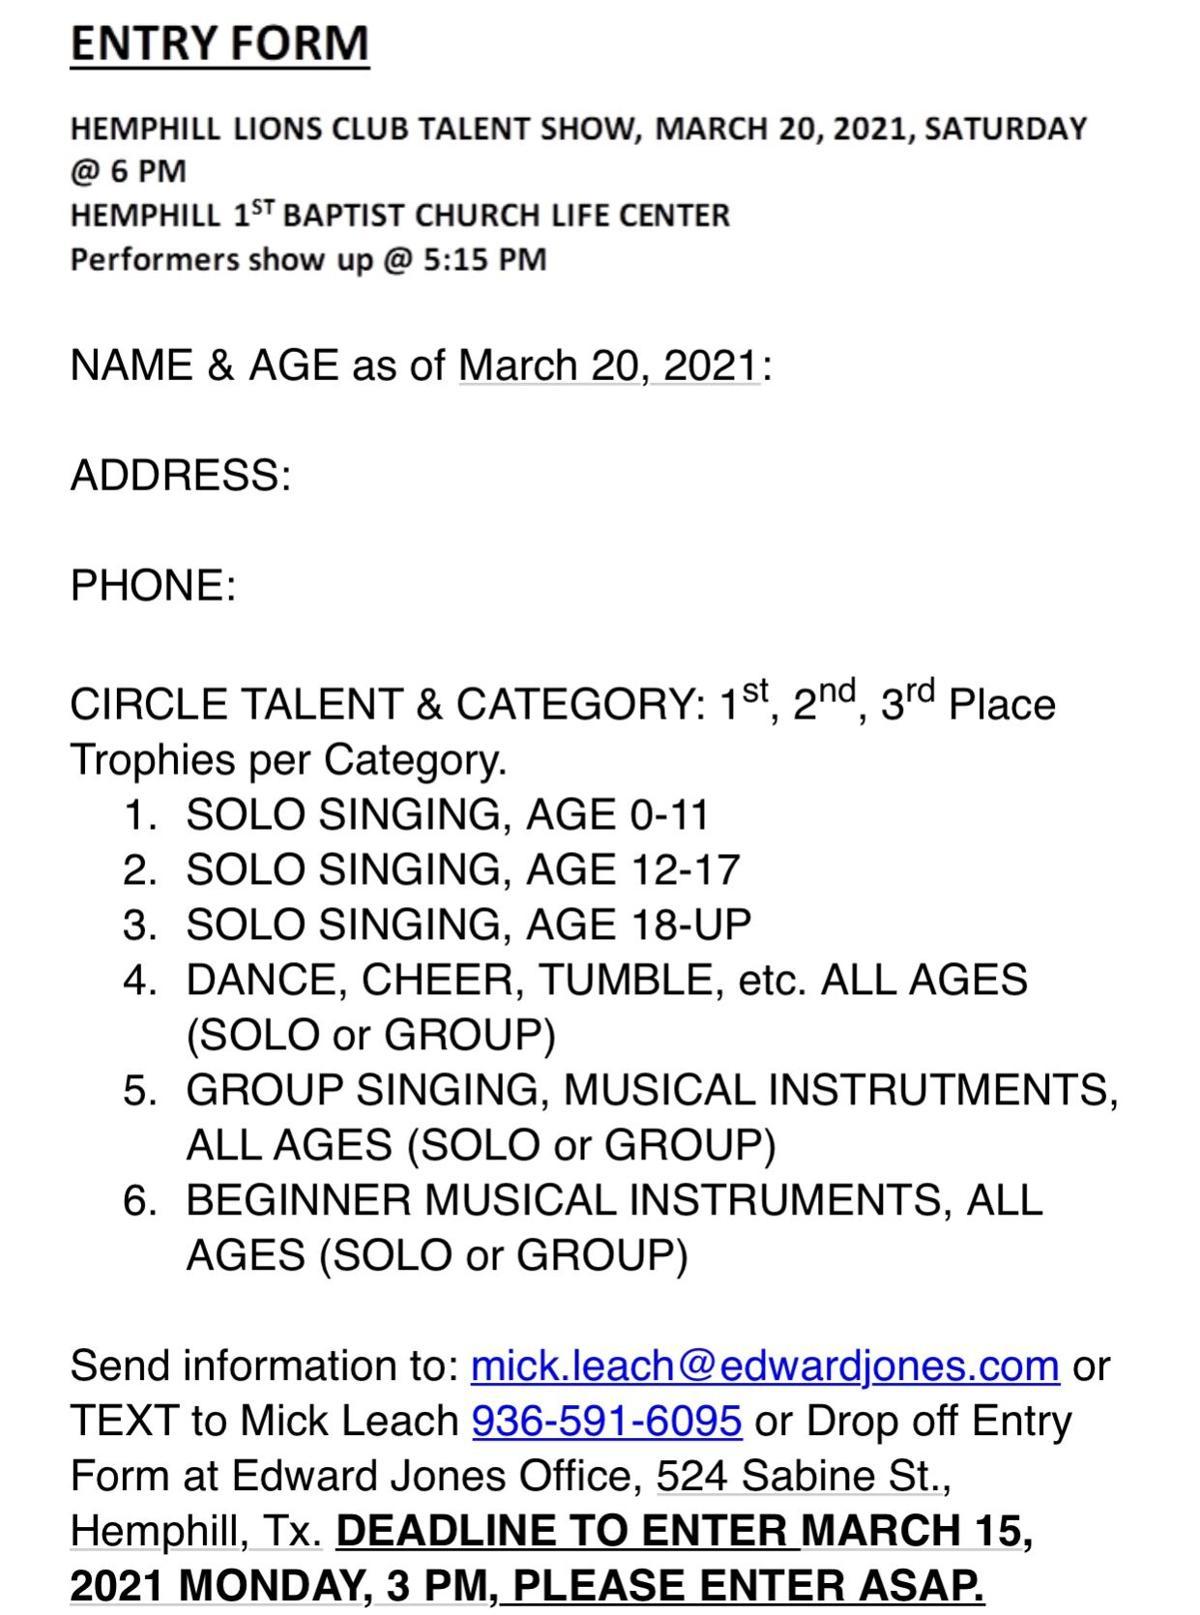 Hemphill Lions Club Talent Show, sign up today